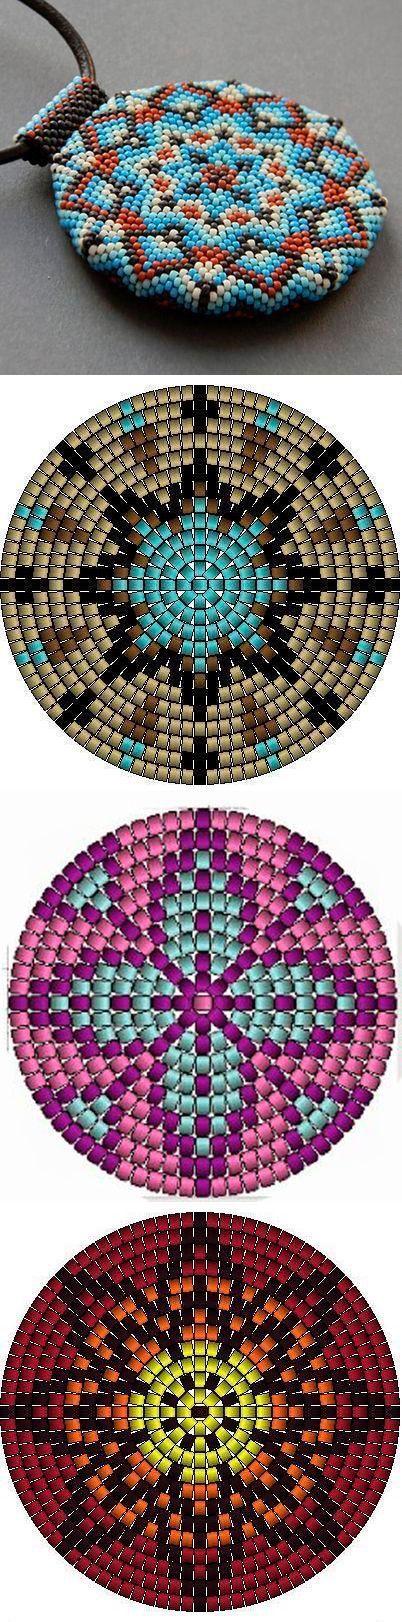 Resultado de imagen de çiçek desenli peyote ve miyukiler